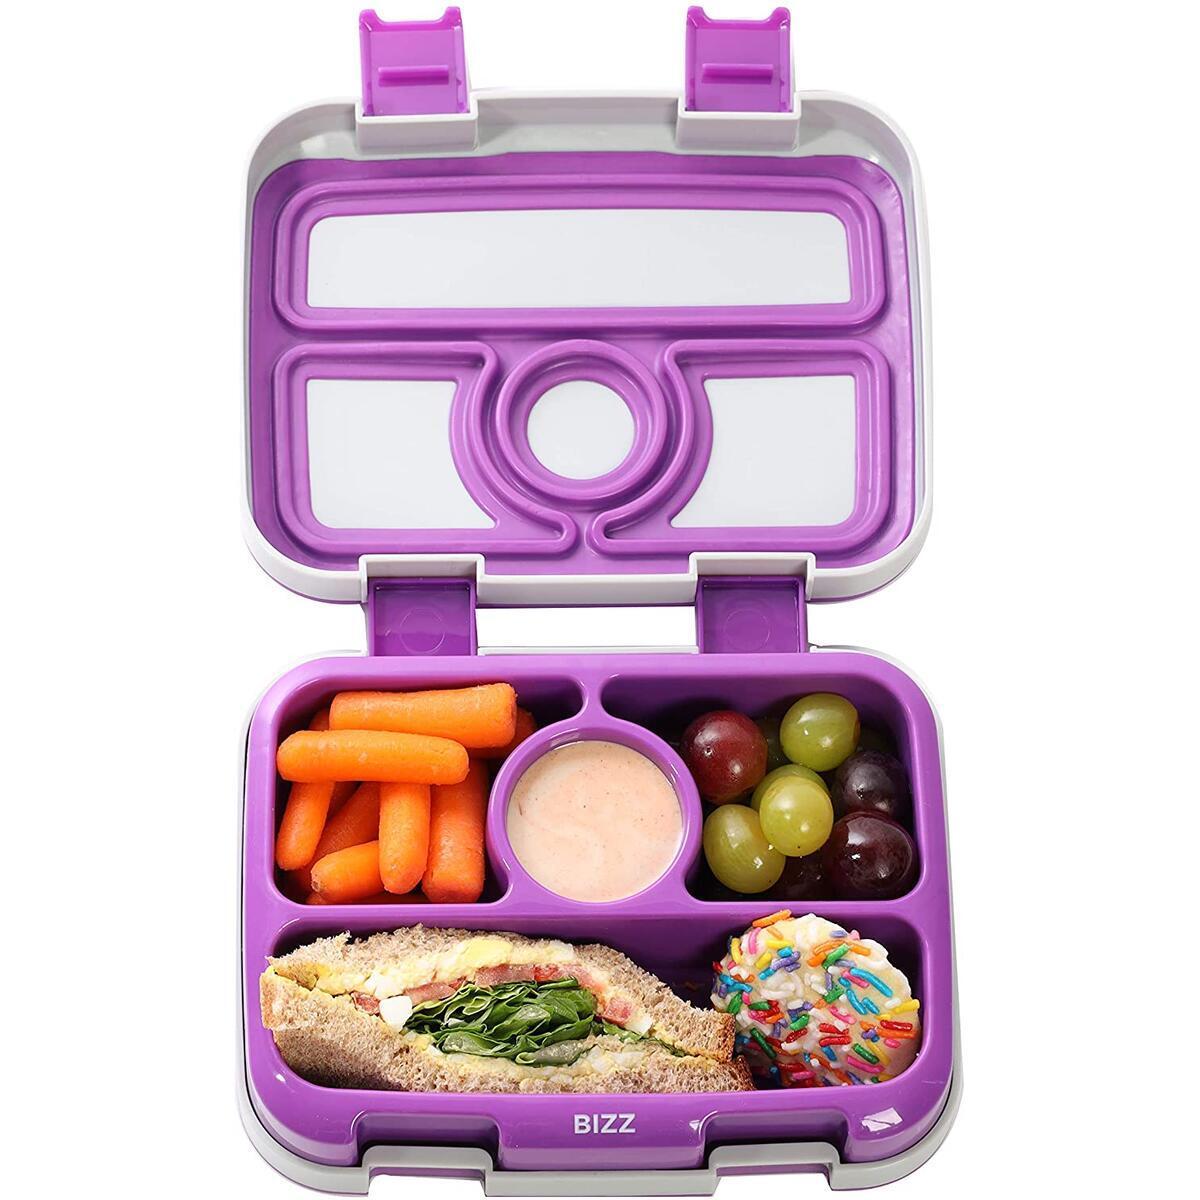 Bento Box - Lunchbox - Stunning NEW Design